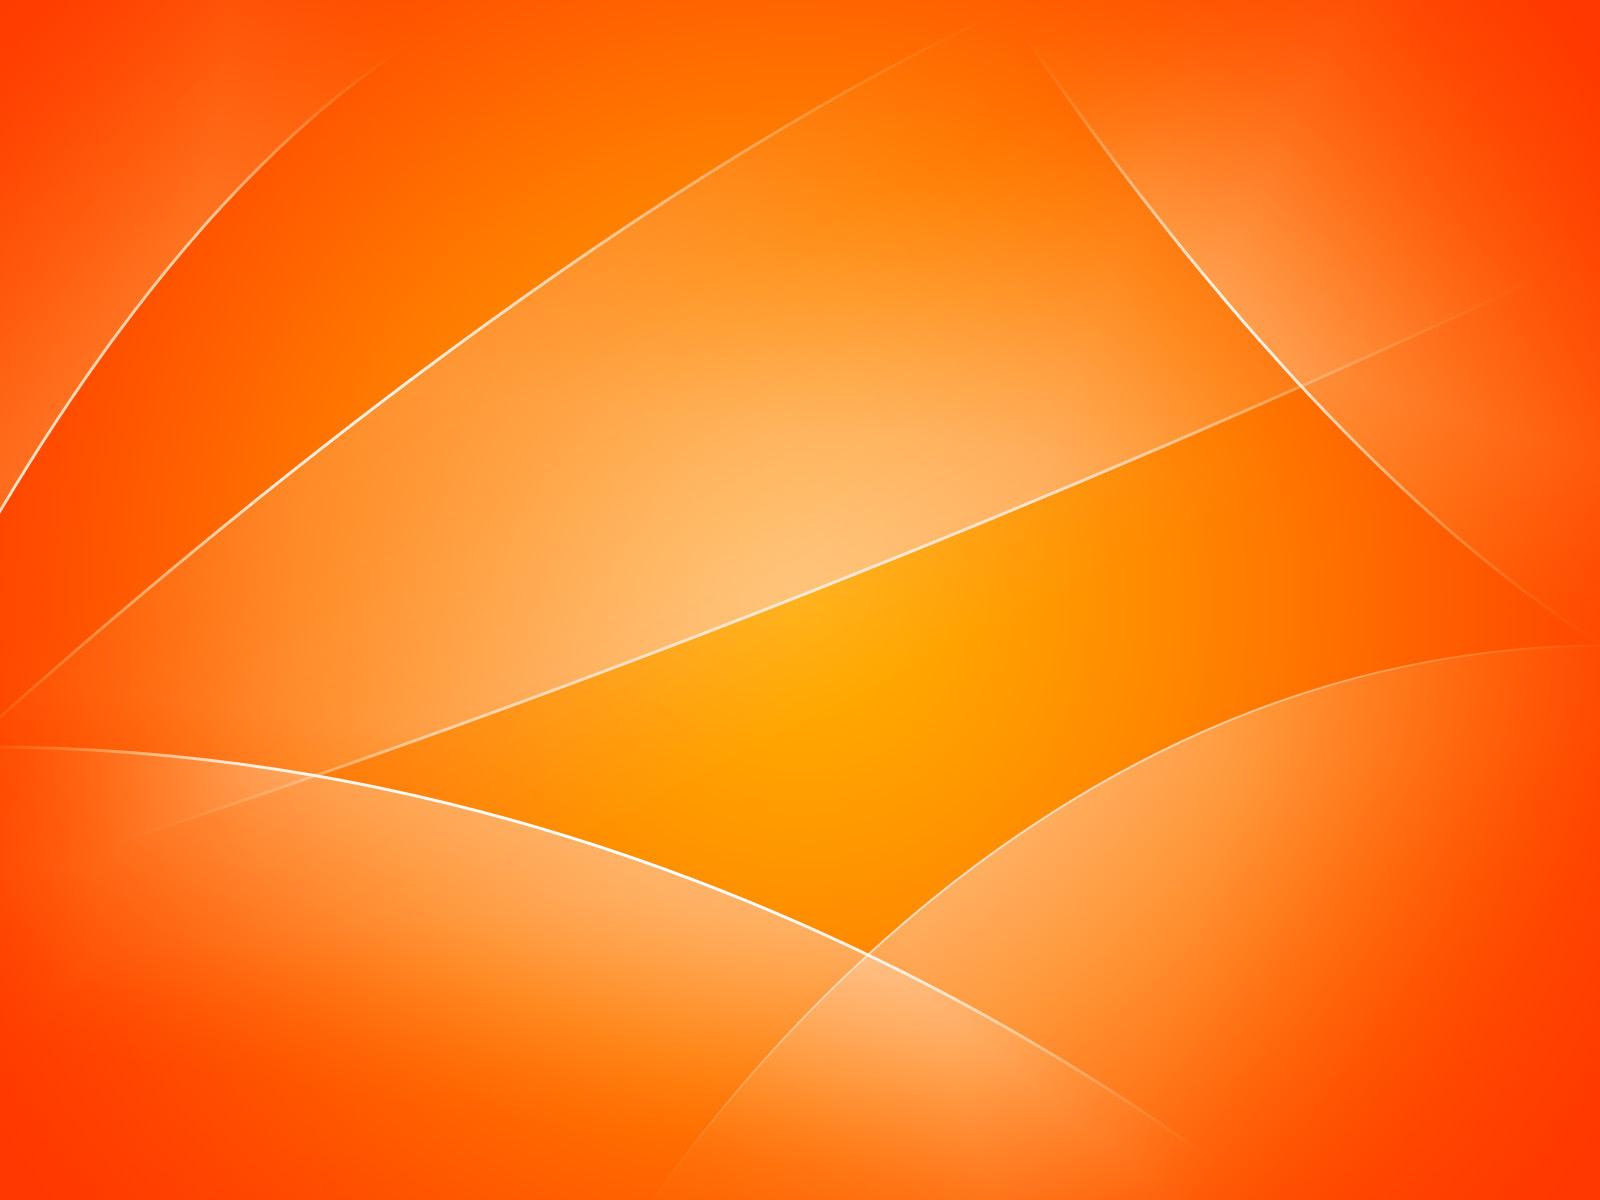 Orange Abstract Shape Background Wallpaper Baltana